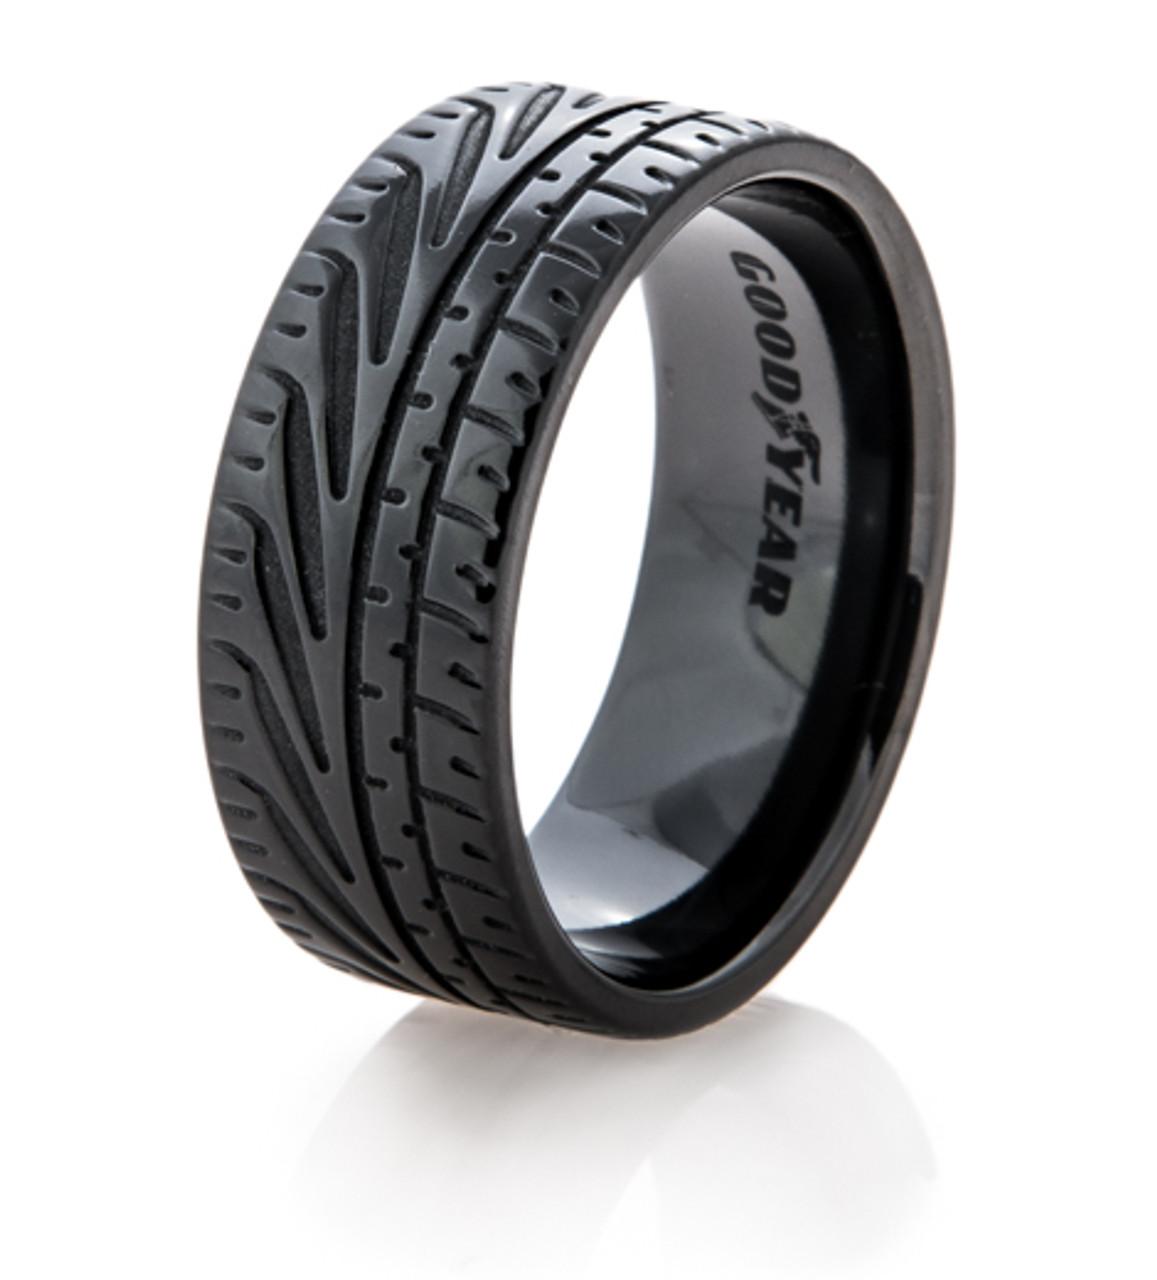 Goodyear Eagle F1 Supercar Tire Wedding Ring Titanium Buzz